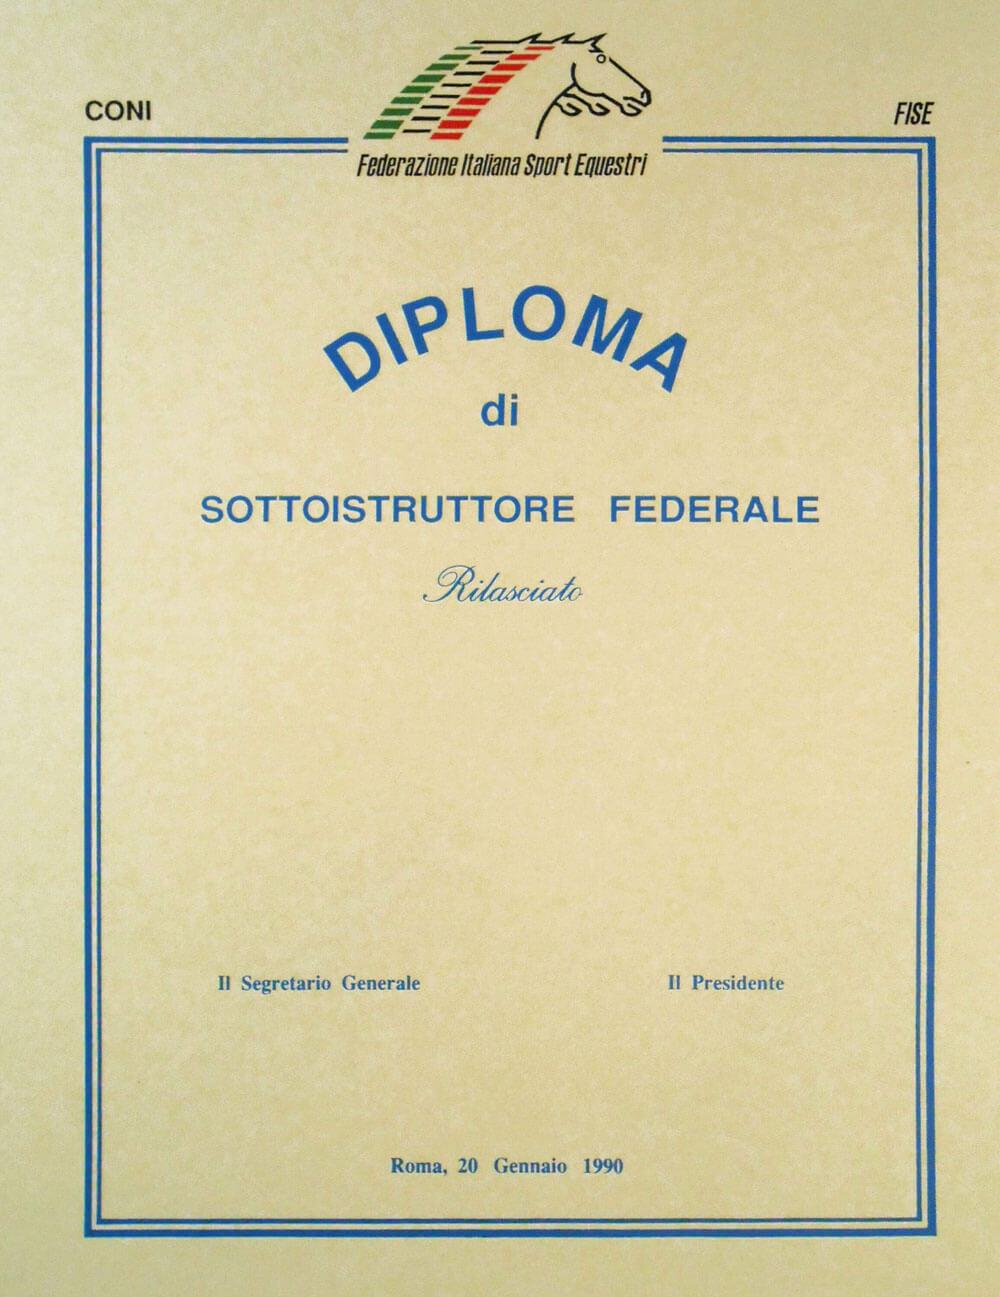 Diploma istruttore federale